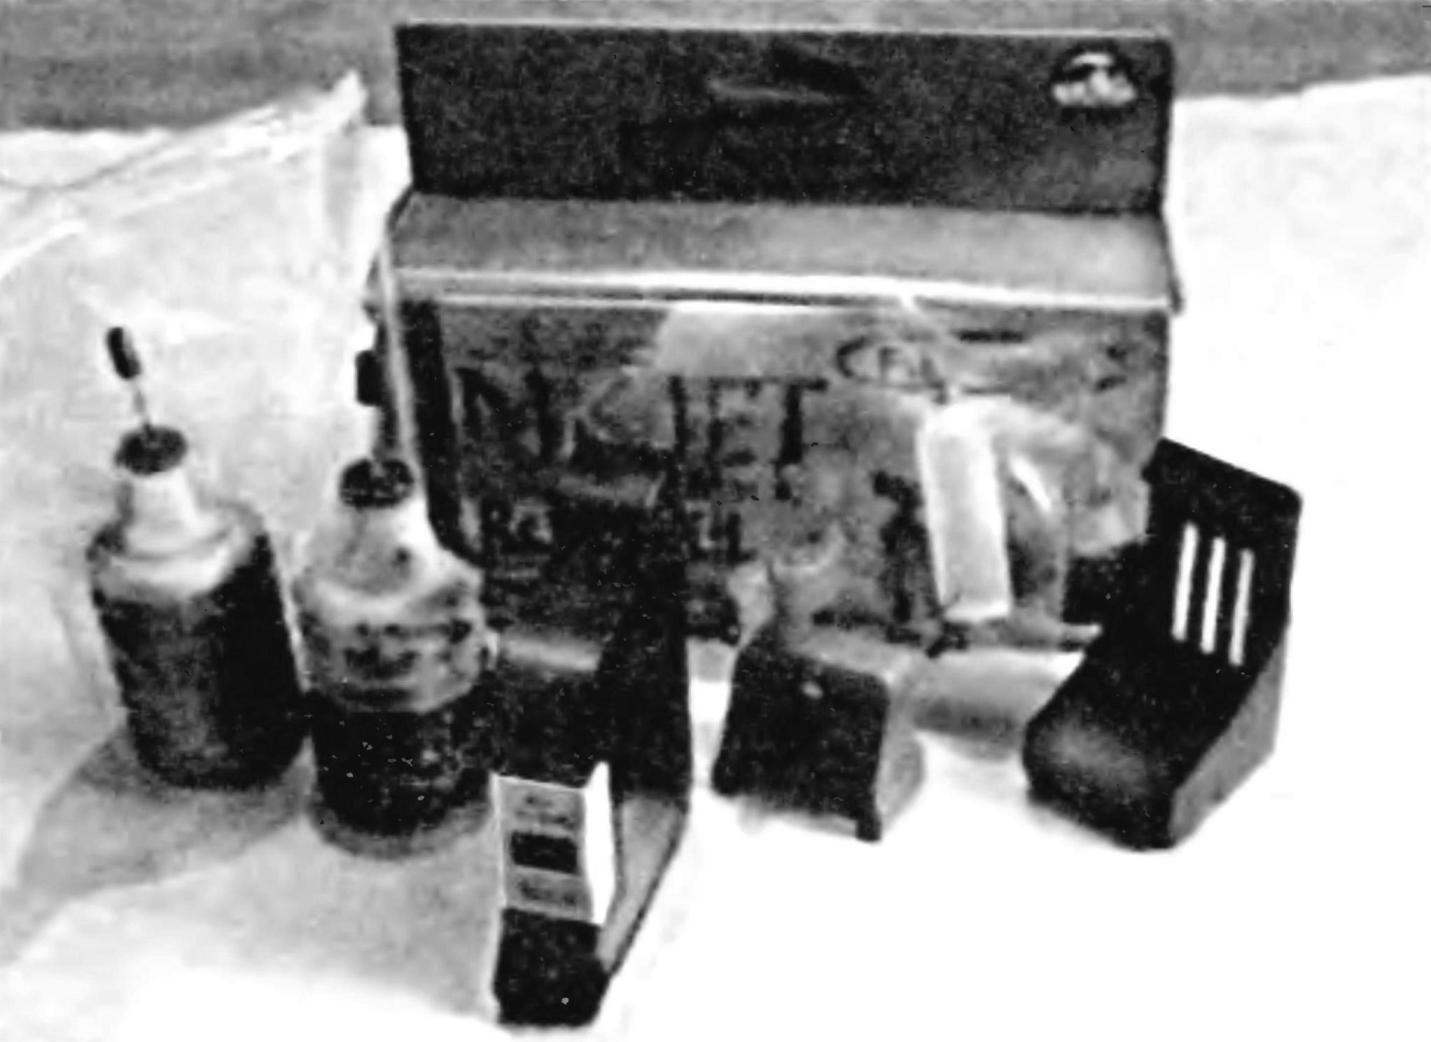 Fig. 1. Offered to the market a kit for refilling inkjet printer